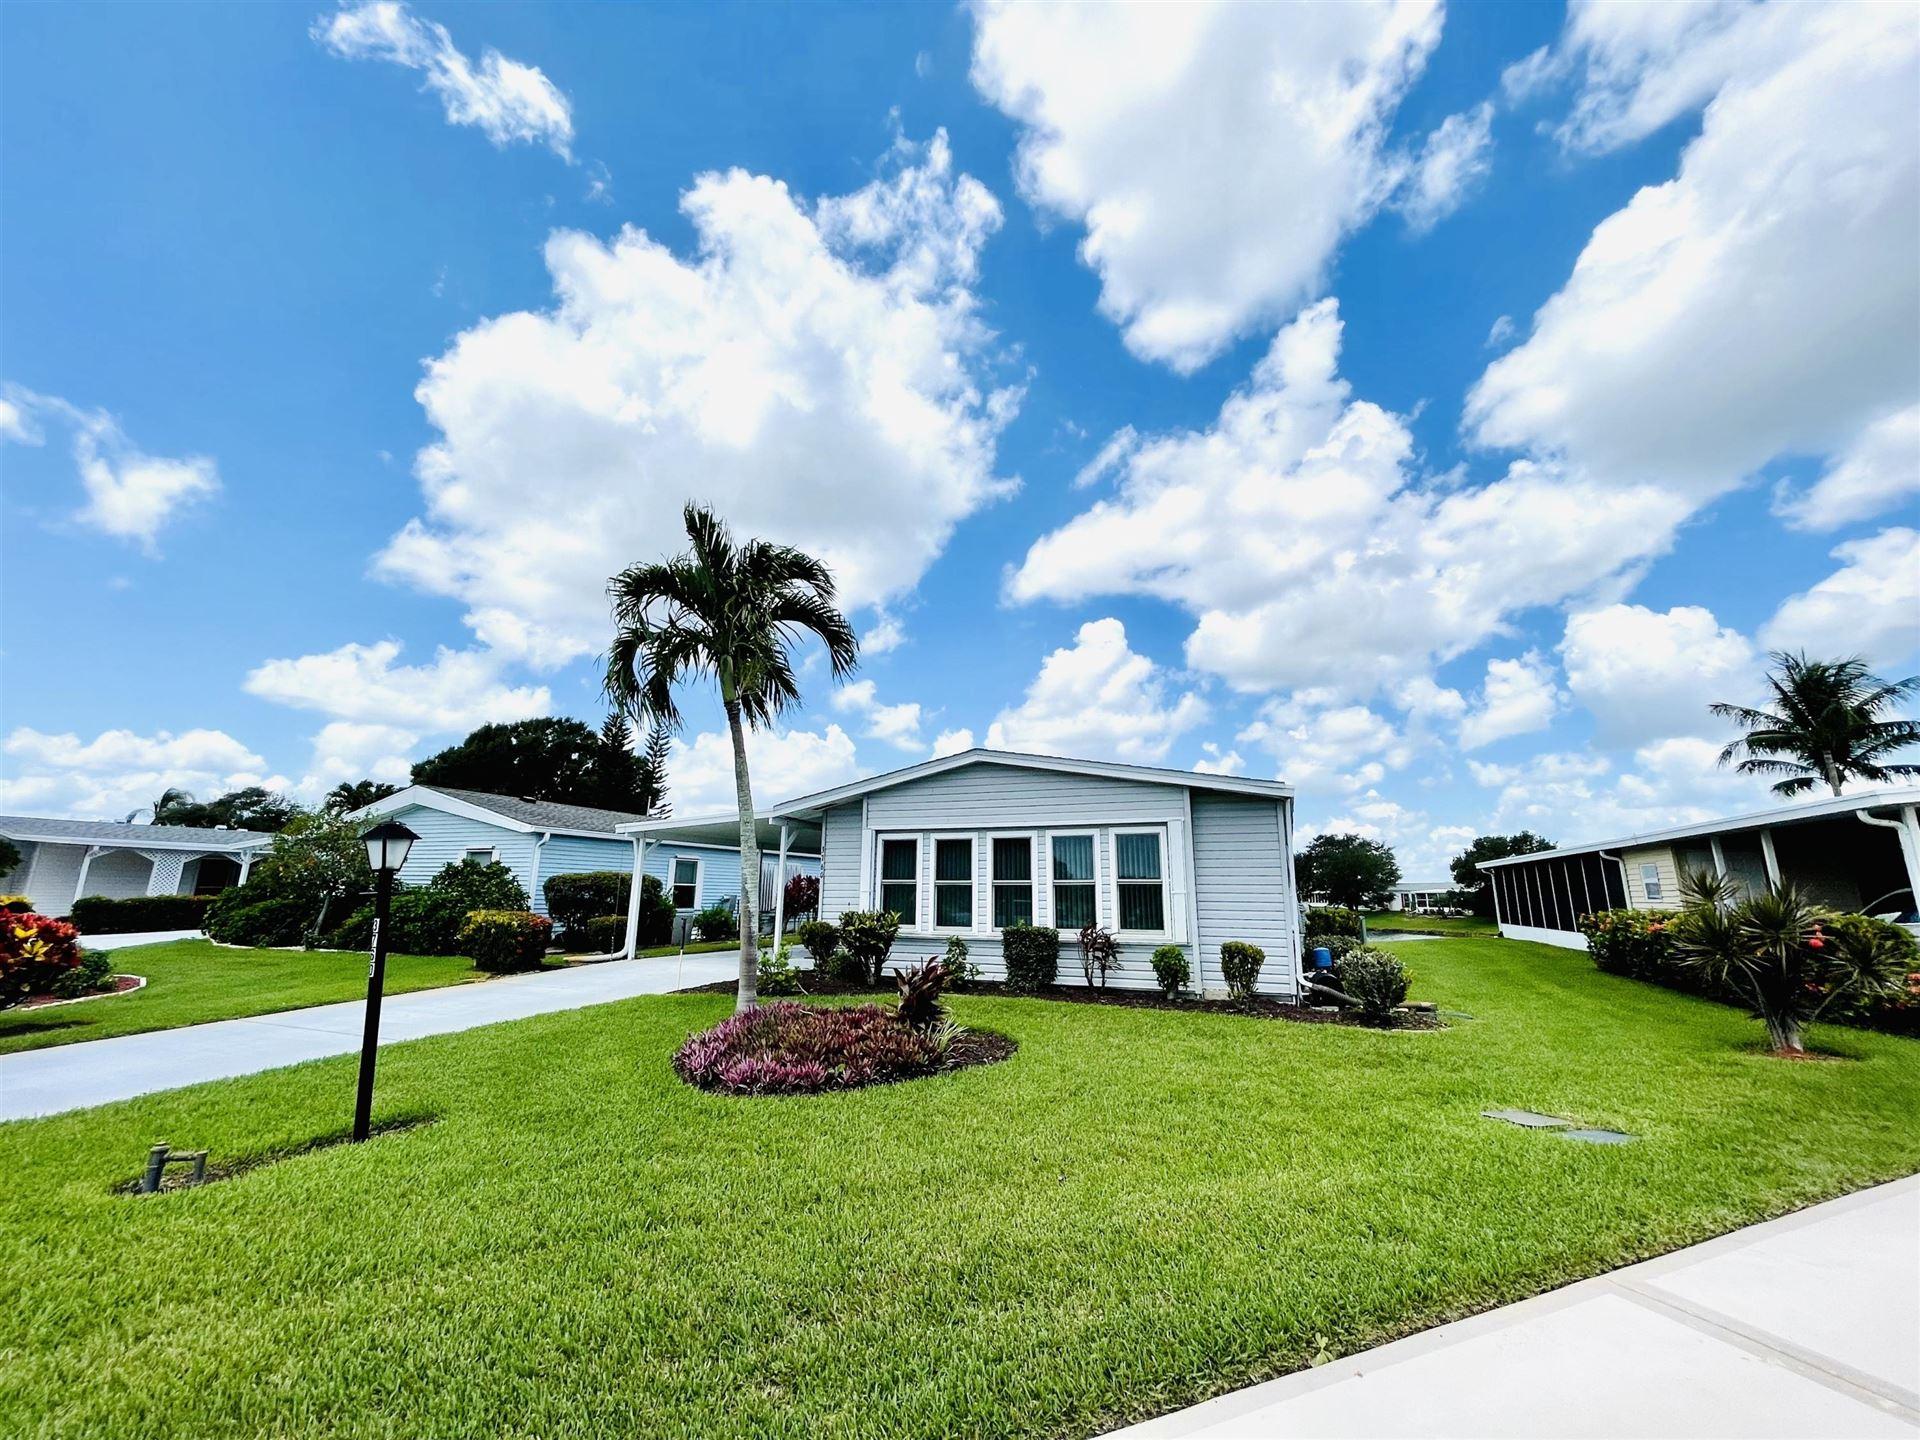 3760 Sage Court, Port Saint Lucie, FL 34952 - MLS#: RX-10730412